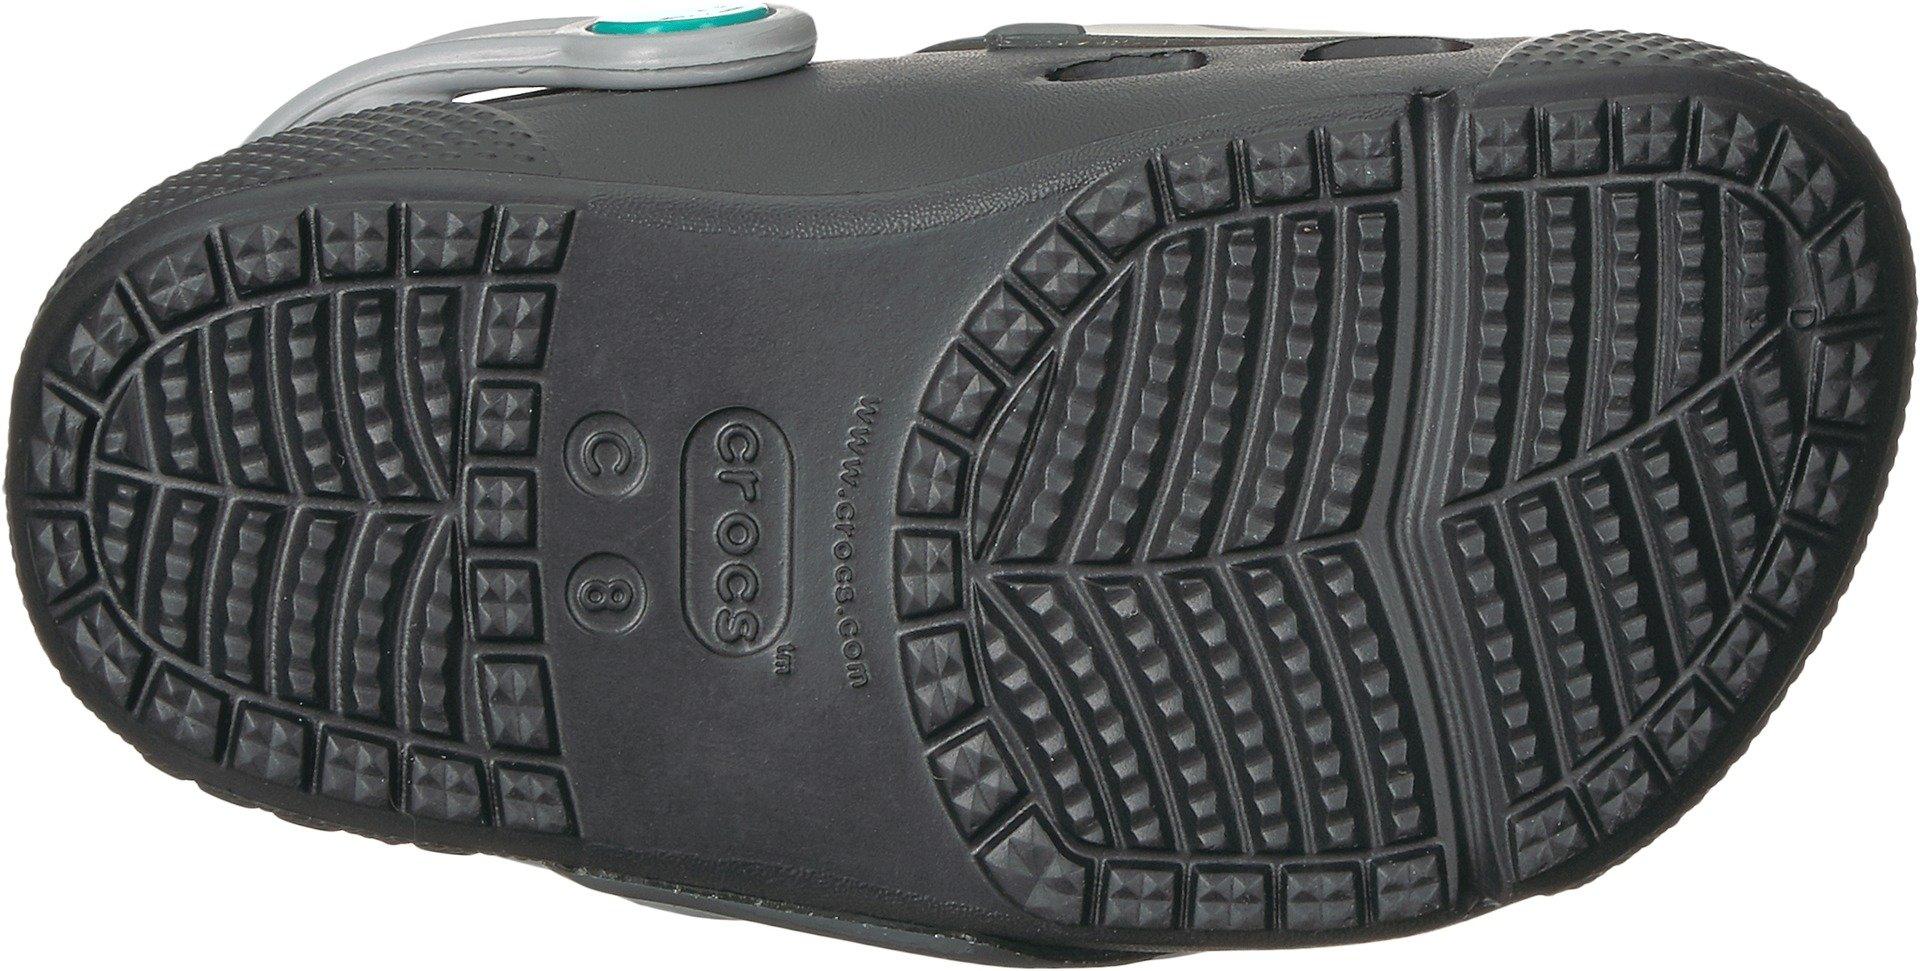 Crocs Unisex Fun Lab Lights Clog K, Black, 1 M US Little Kid by Crocs (Image #3)